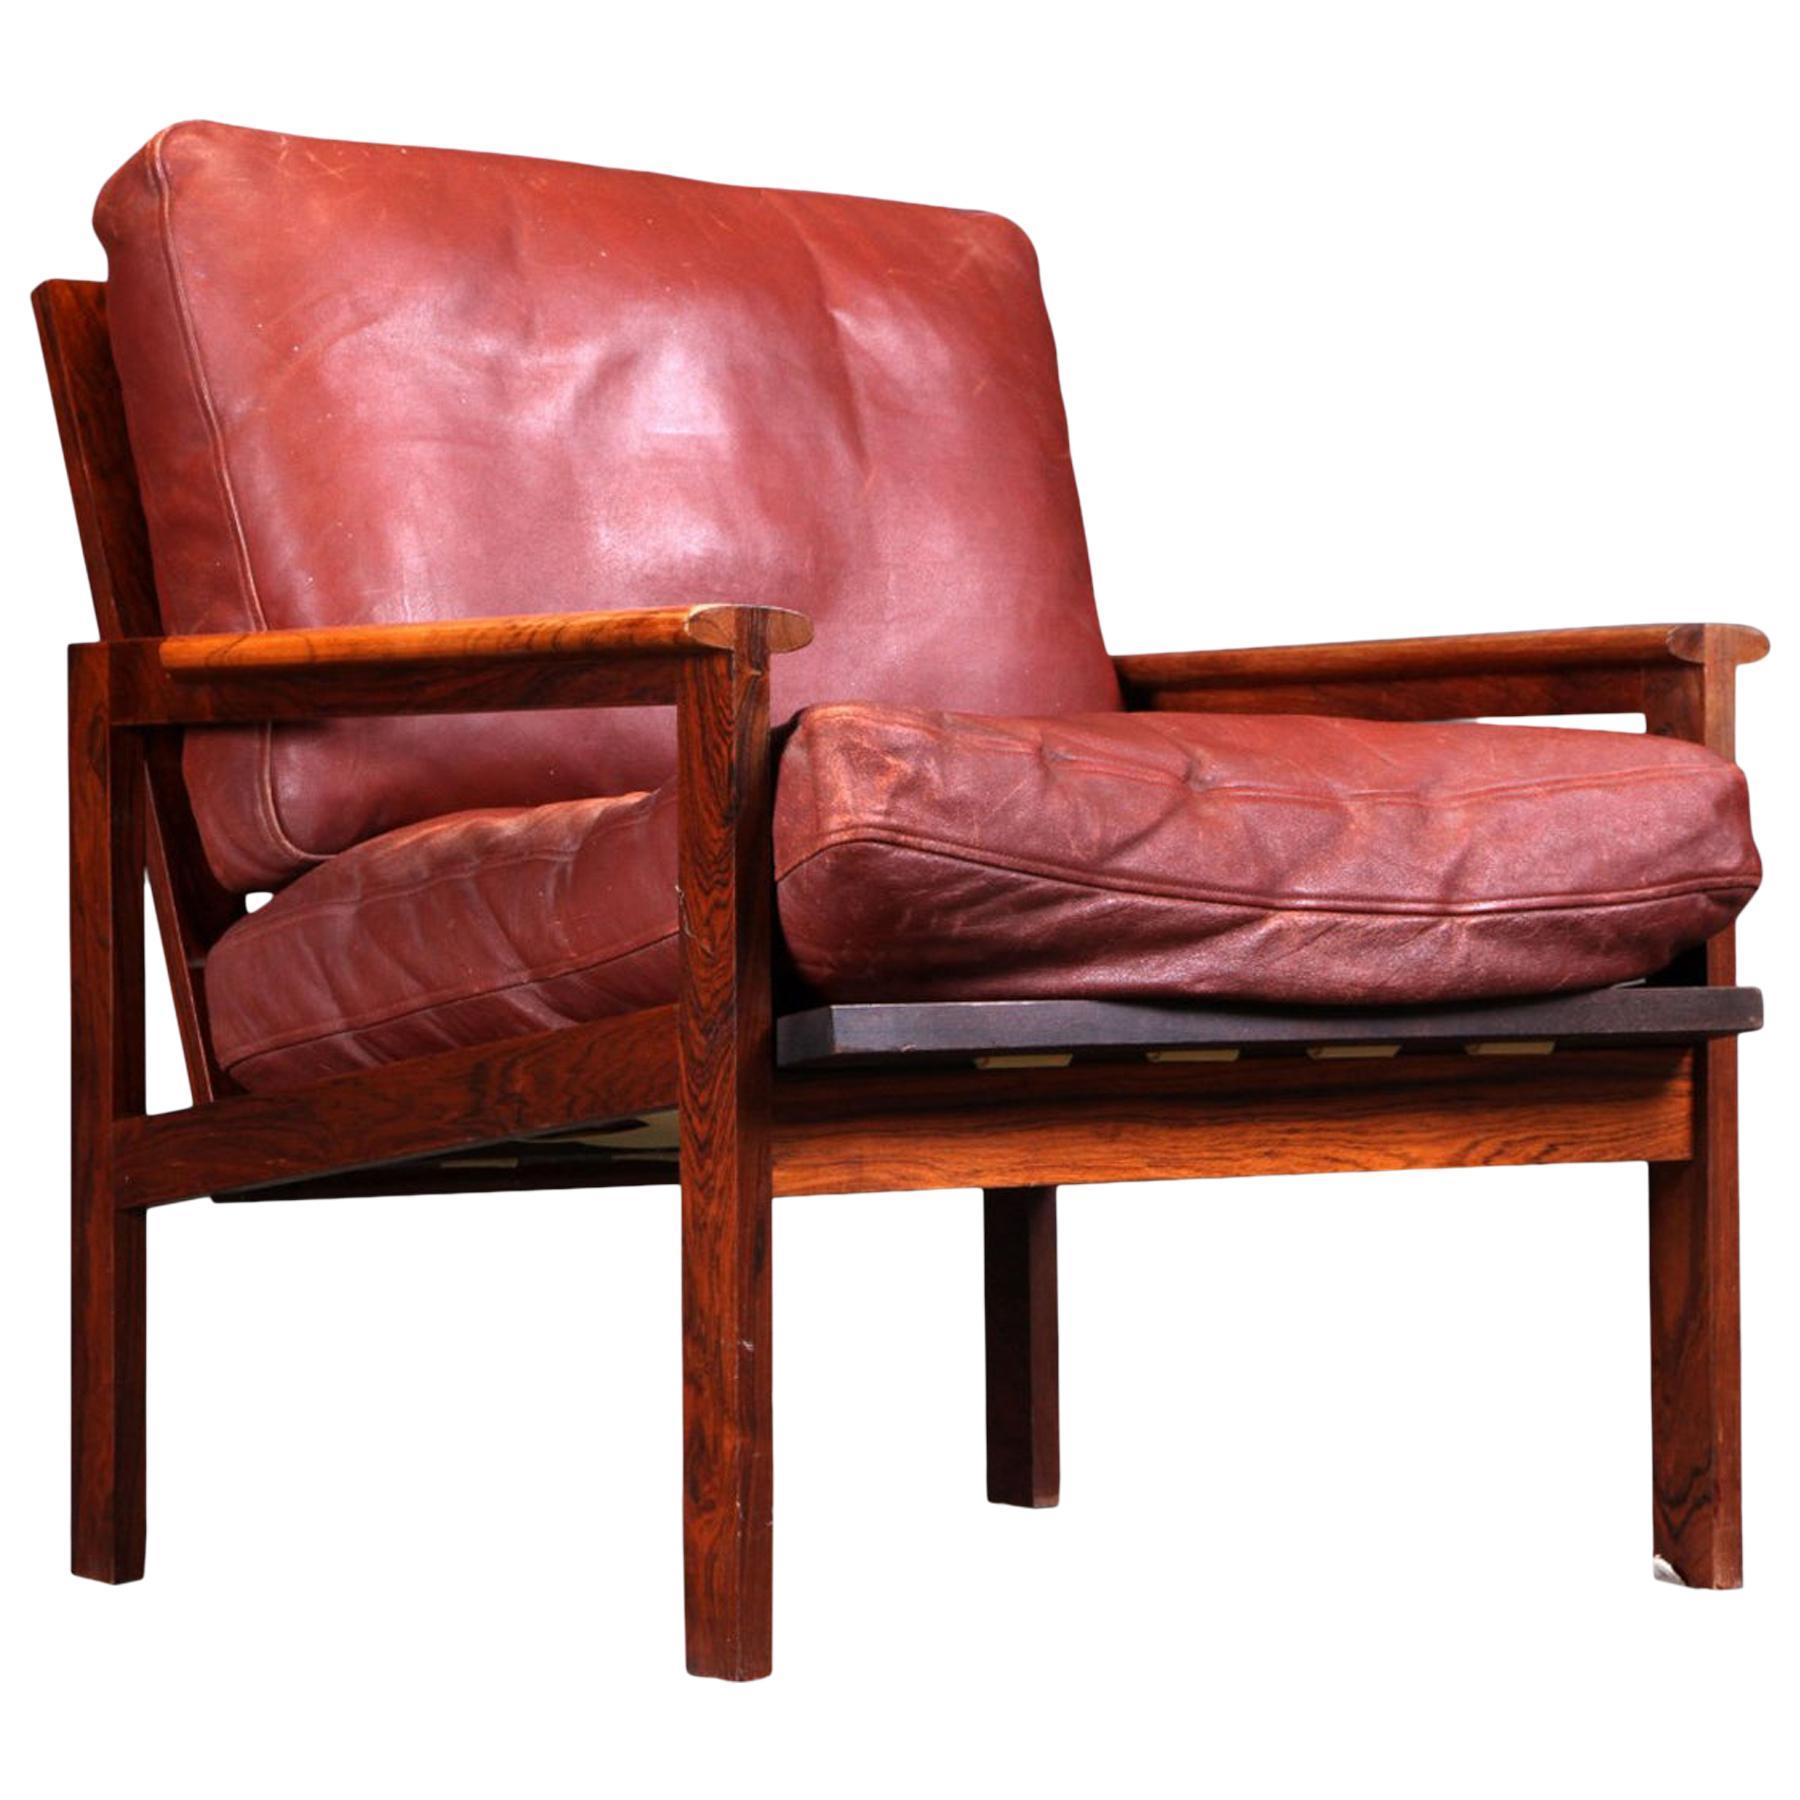 Illum Wikkelsø Capella Lounge Chair in Rosewood